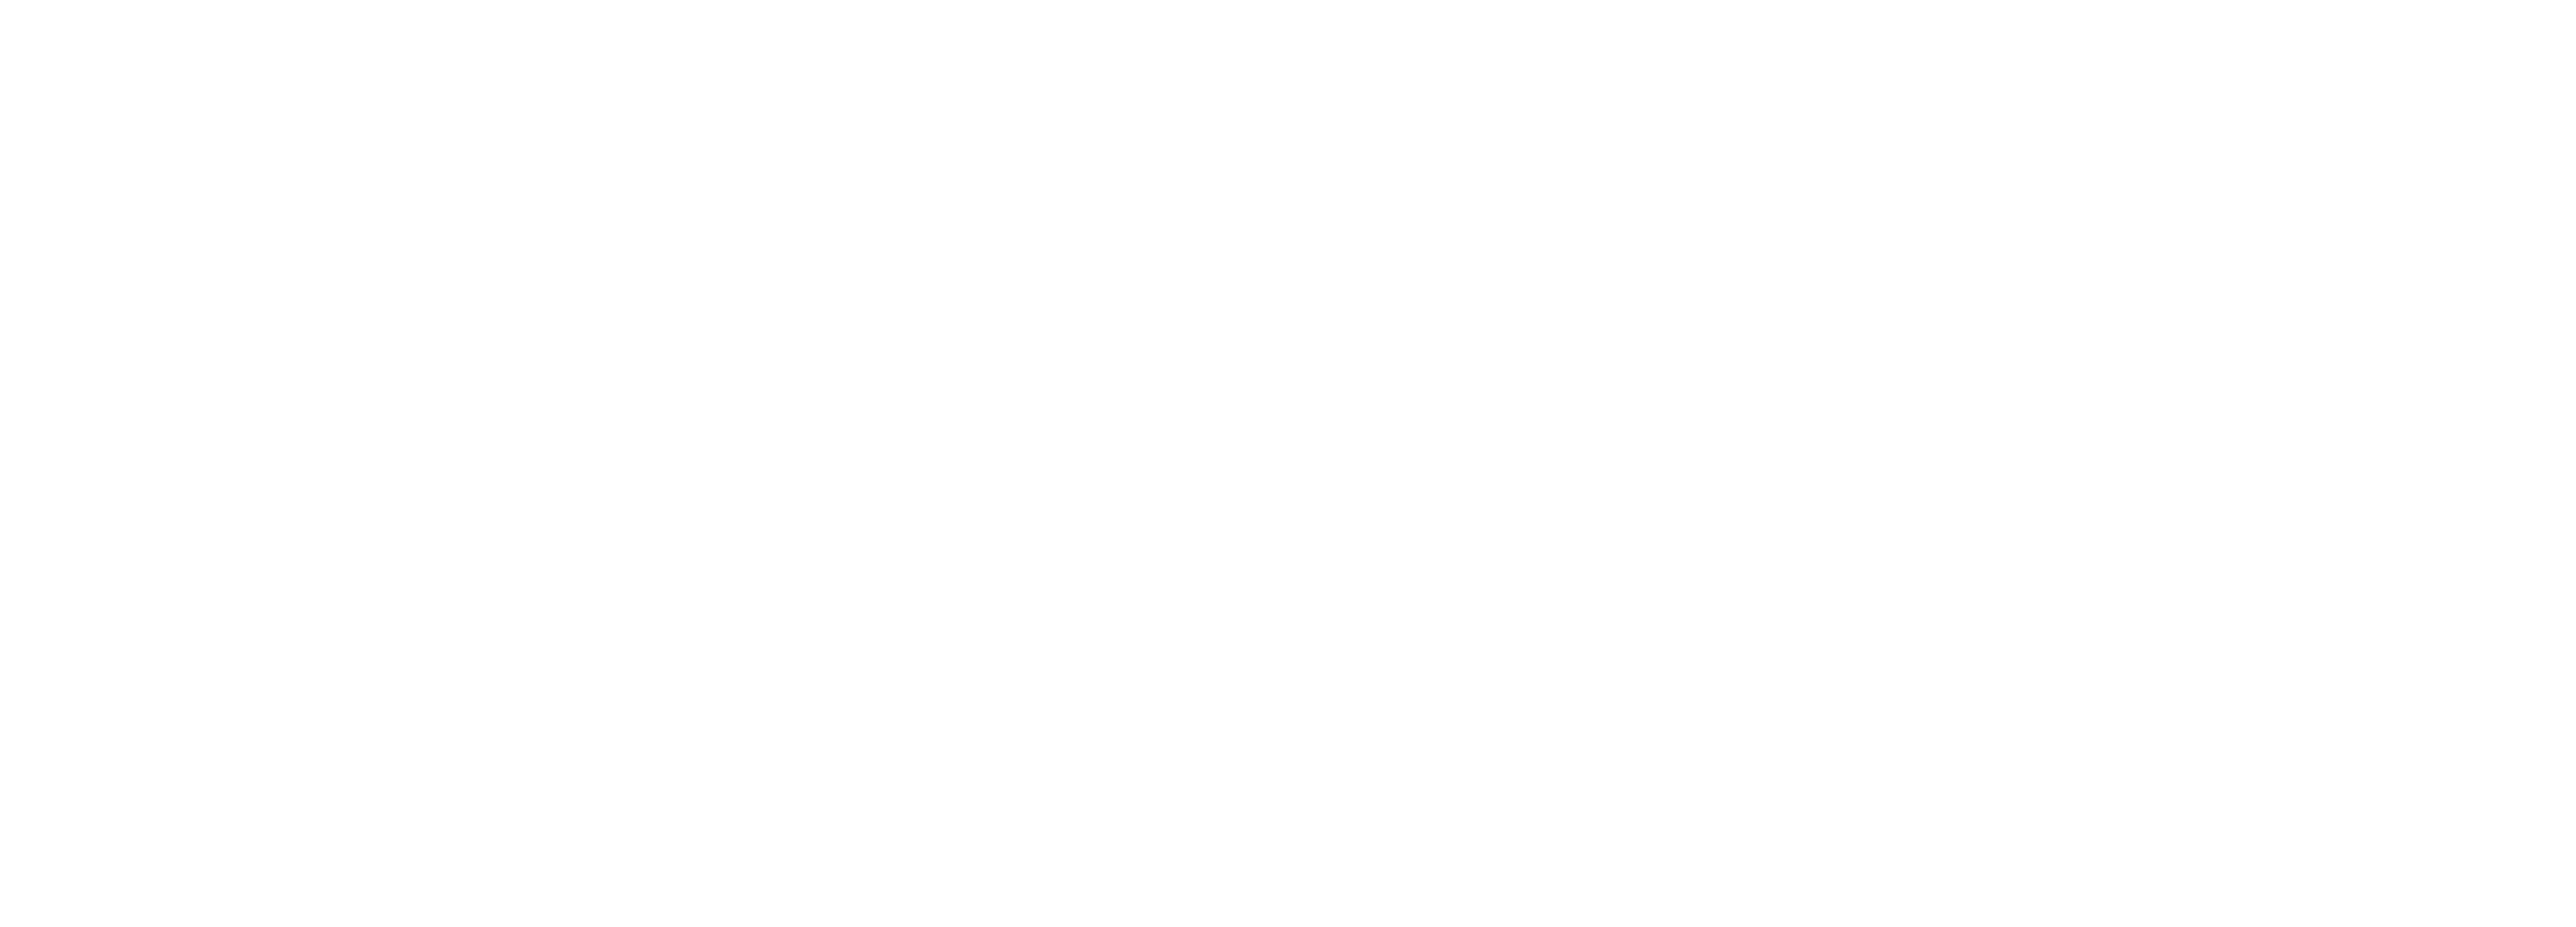 Fargo-Moorhead LGBT Film Festival 2020